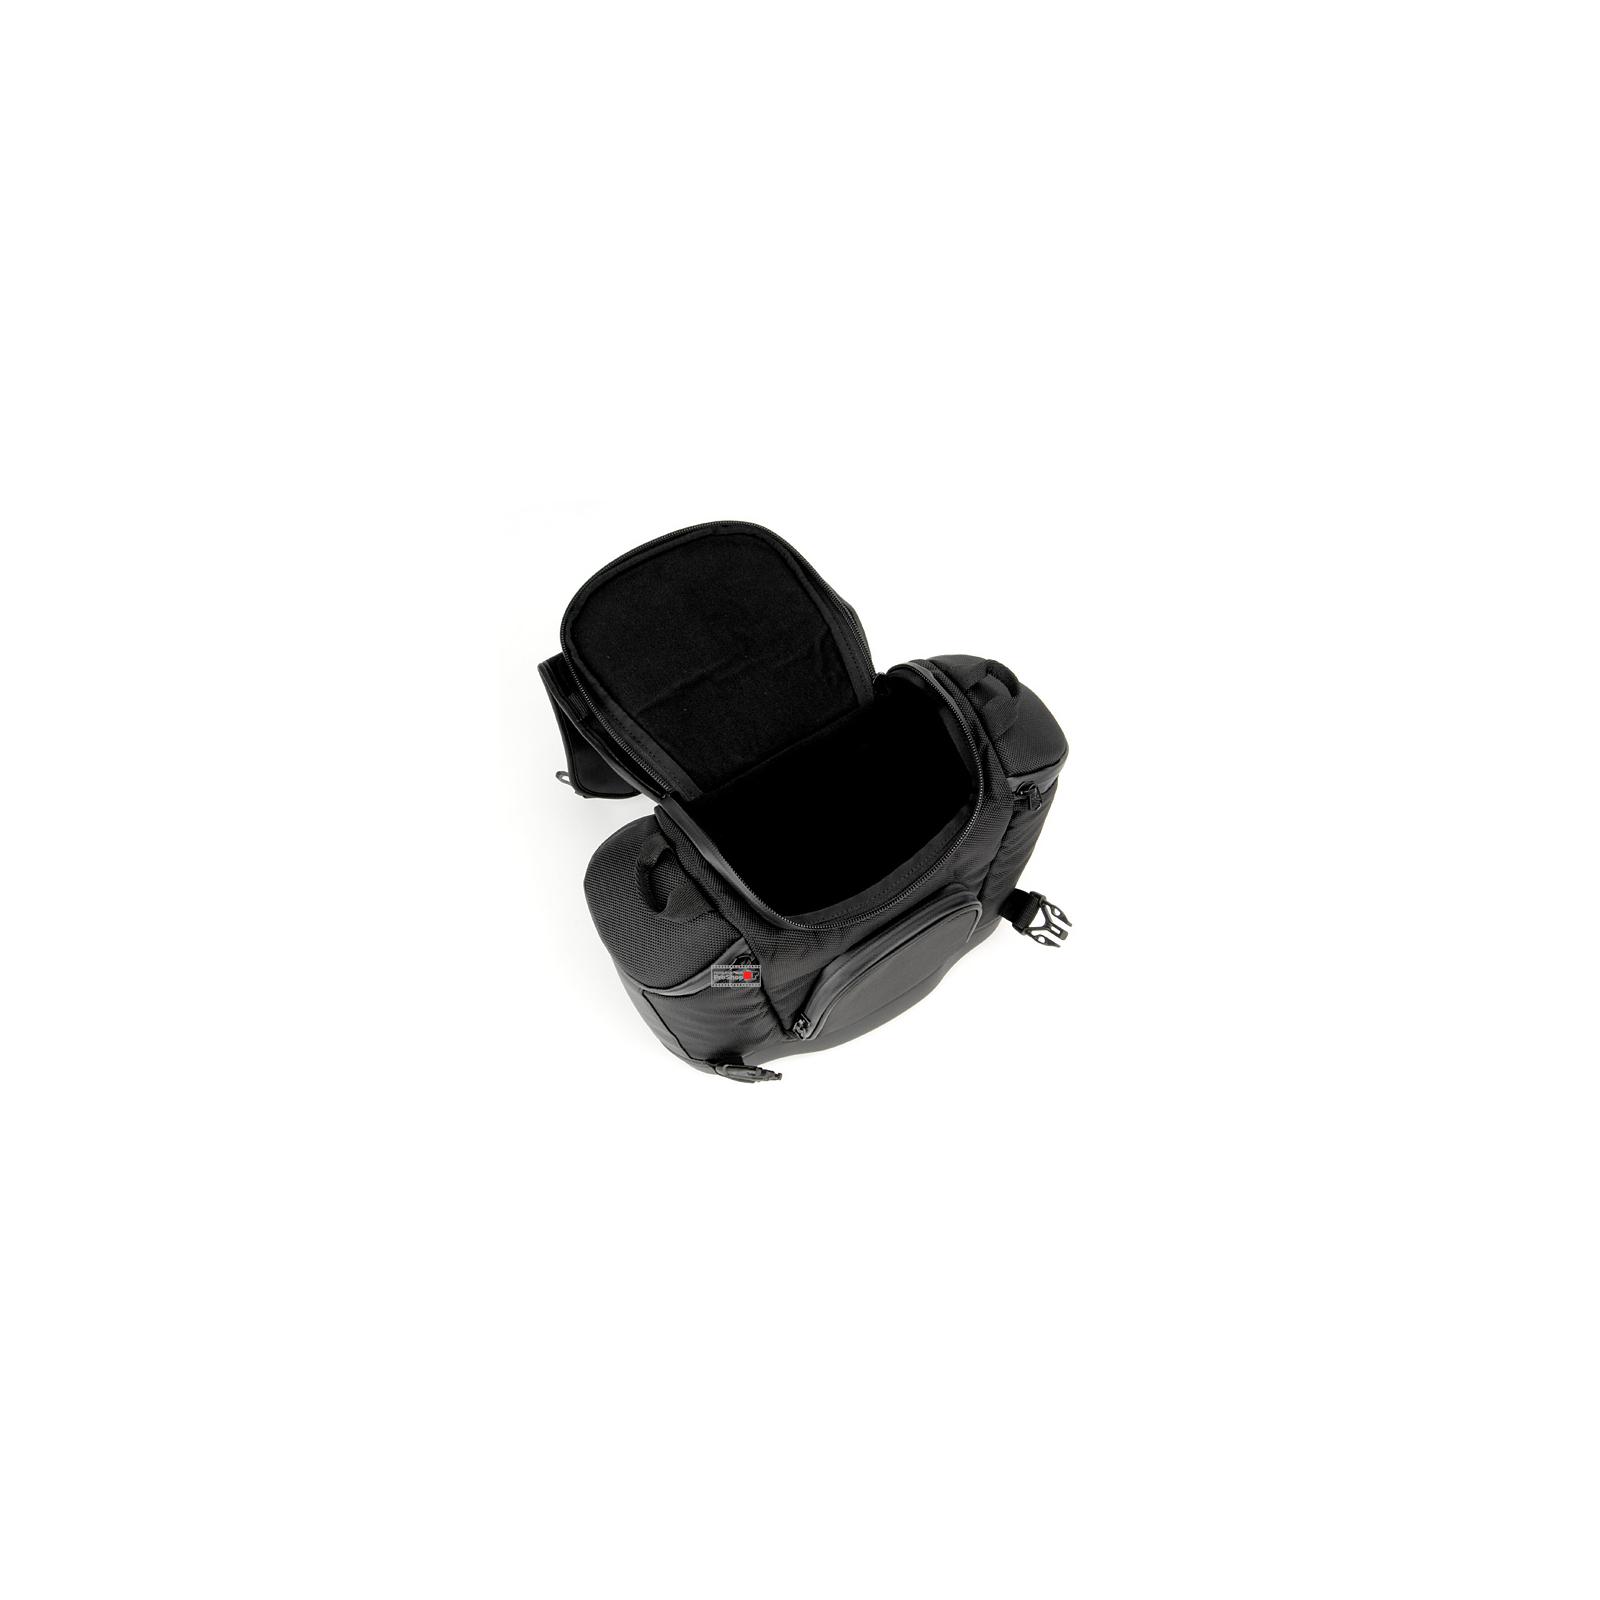 Фото-сумка Fujifilm SC-X black (04004455) изображение 4